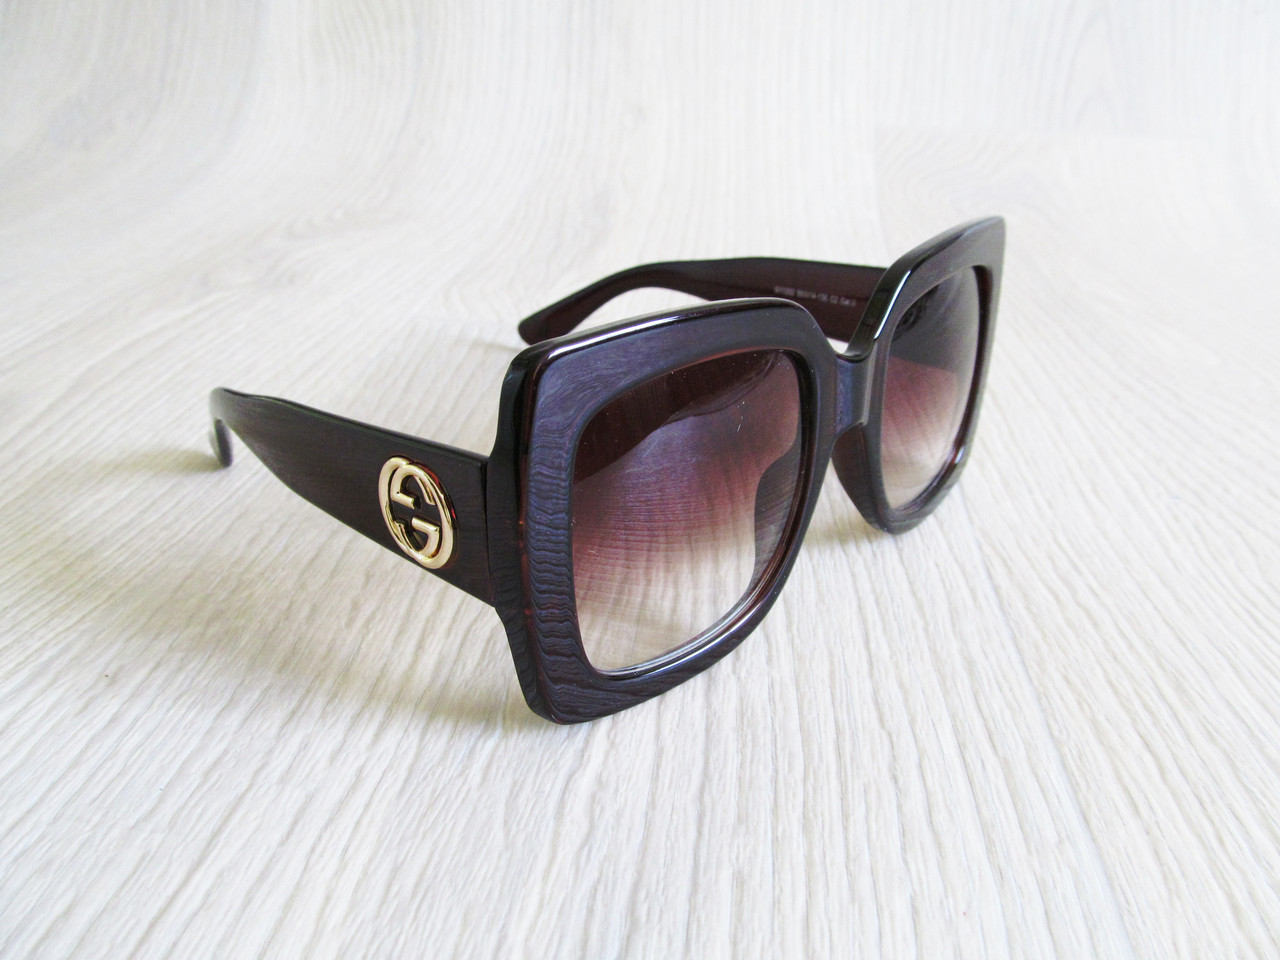 9de9c1b6058e Солнцезащитные очки бренд реплика Гуччи -